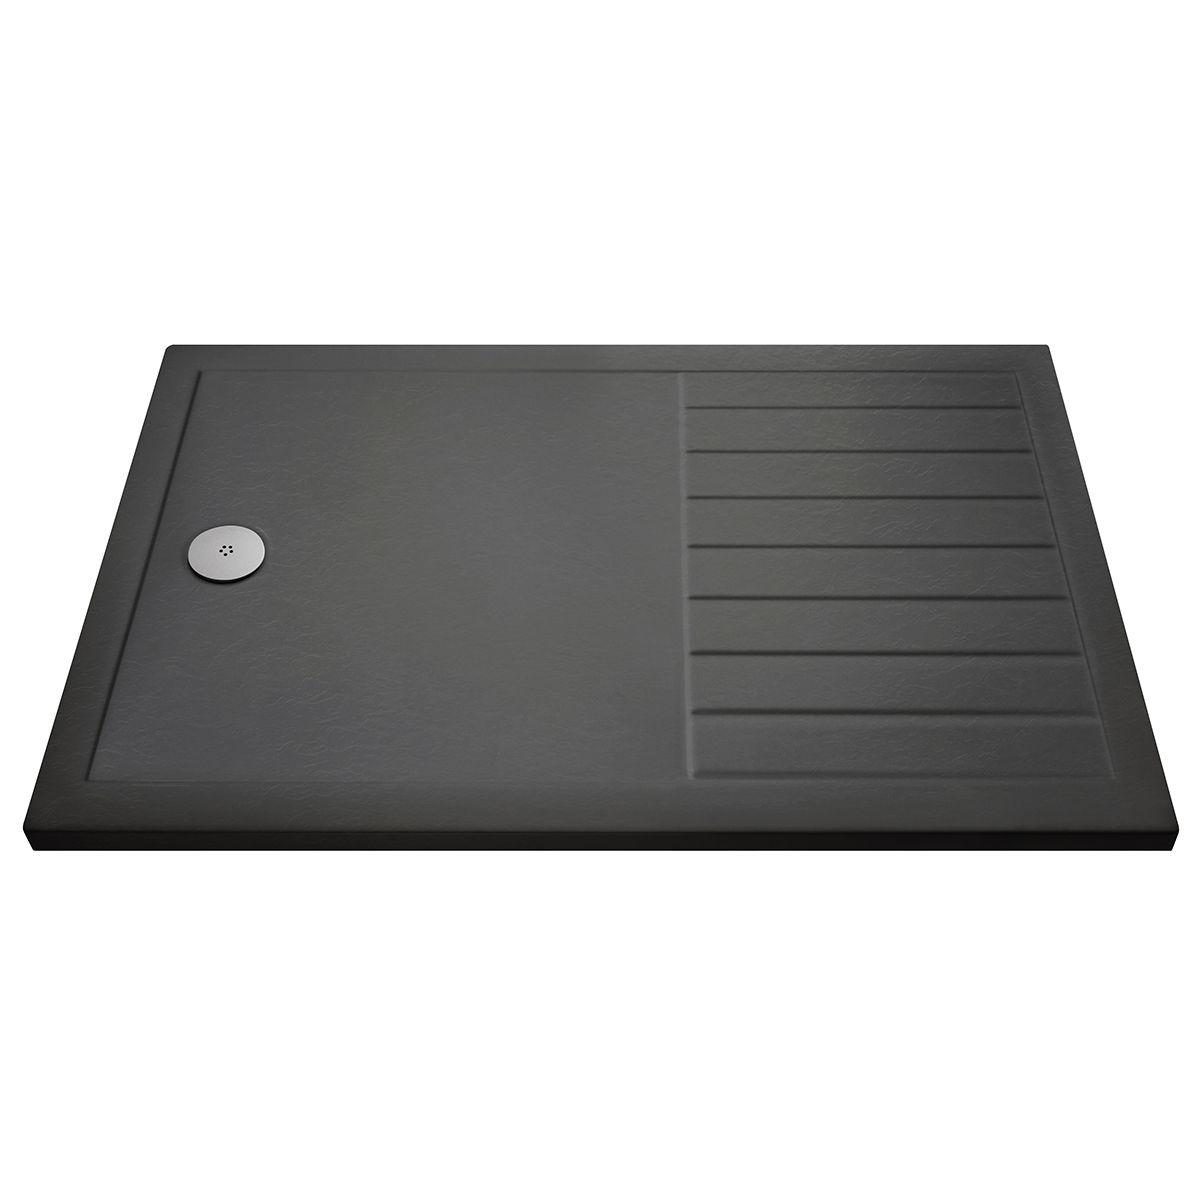 Pearlstone Slate Grey Rectangular Walk-In Shower Tray 1600 x 800mm